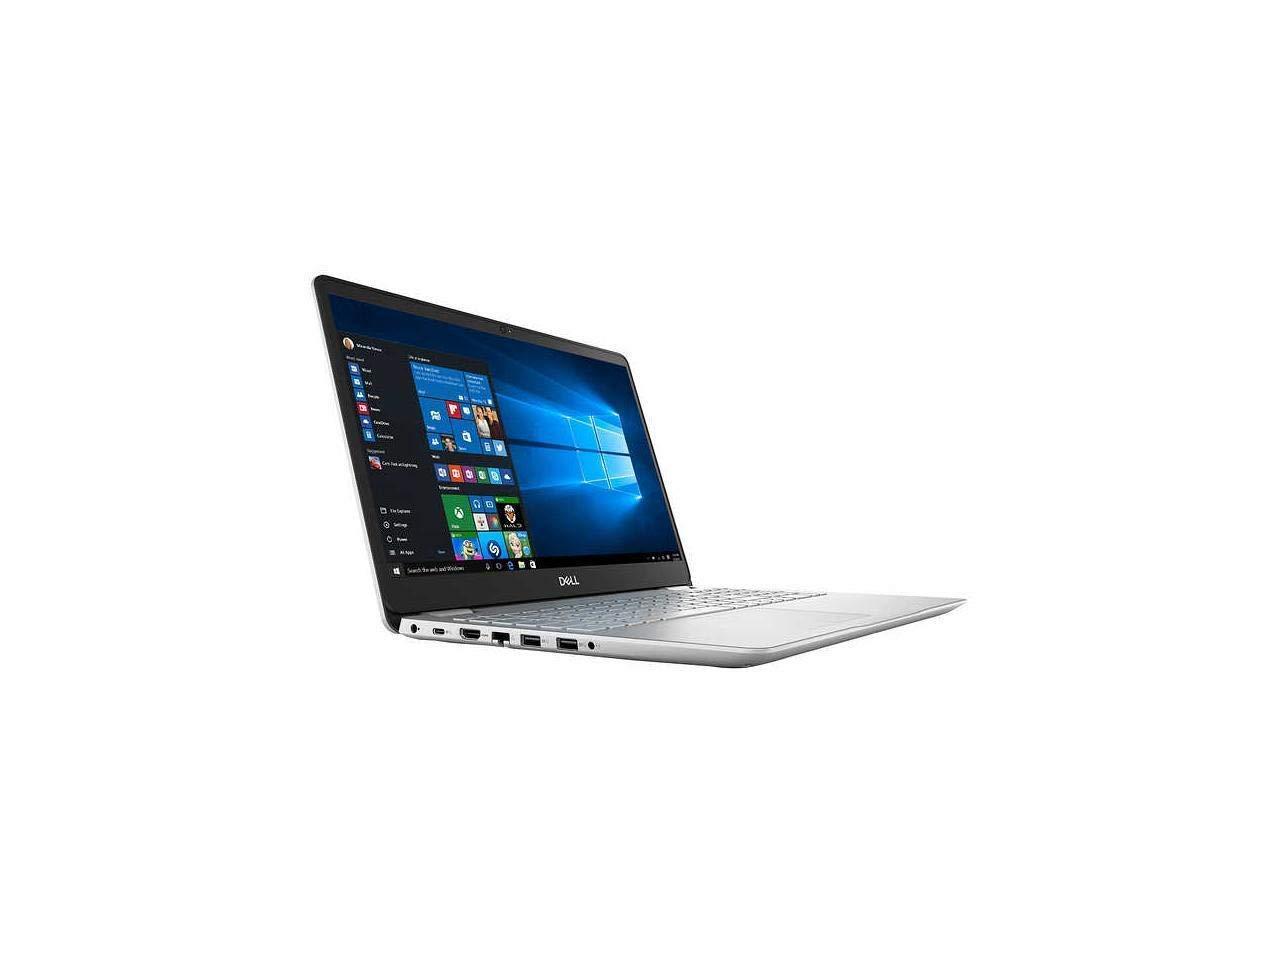 "Dell Inspiron 15 5000, 2019 15.6"" FHD Touchscreen Laptop, Intel 4-Core i5-8265U, 12GB RAM, 256GB PCIe SSD by 16GB Optane, 1TB HDD, Backlit KB Fingerprint Reader MaxxAudio Win 10/Accessories Bundle 3"